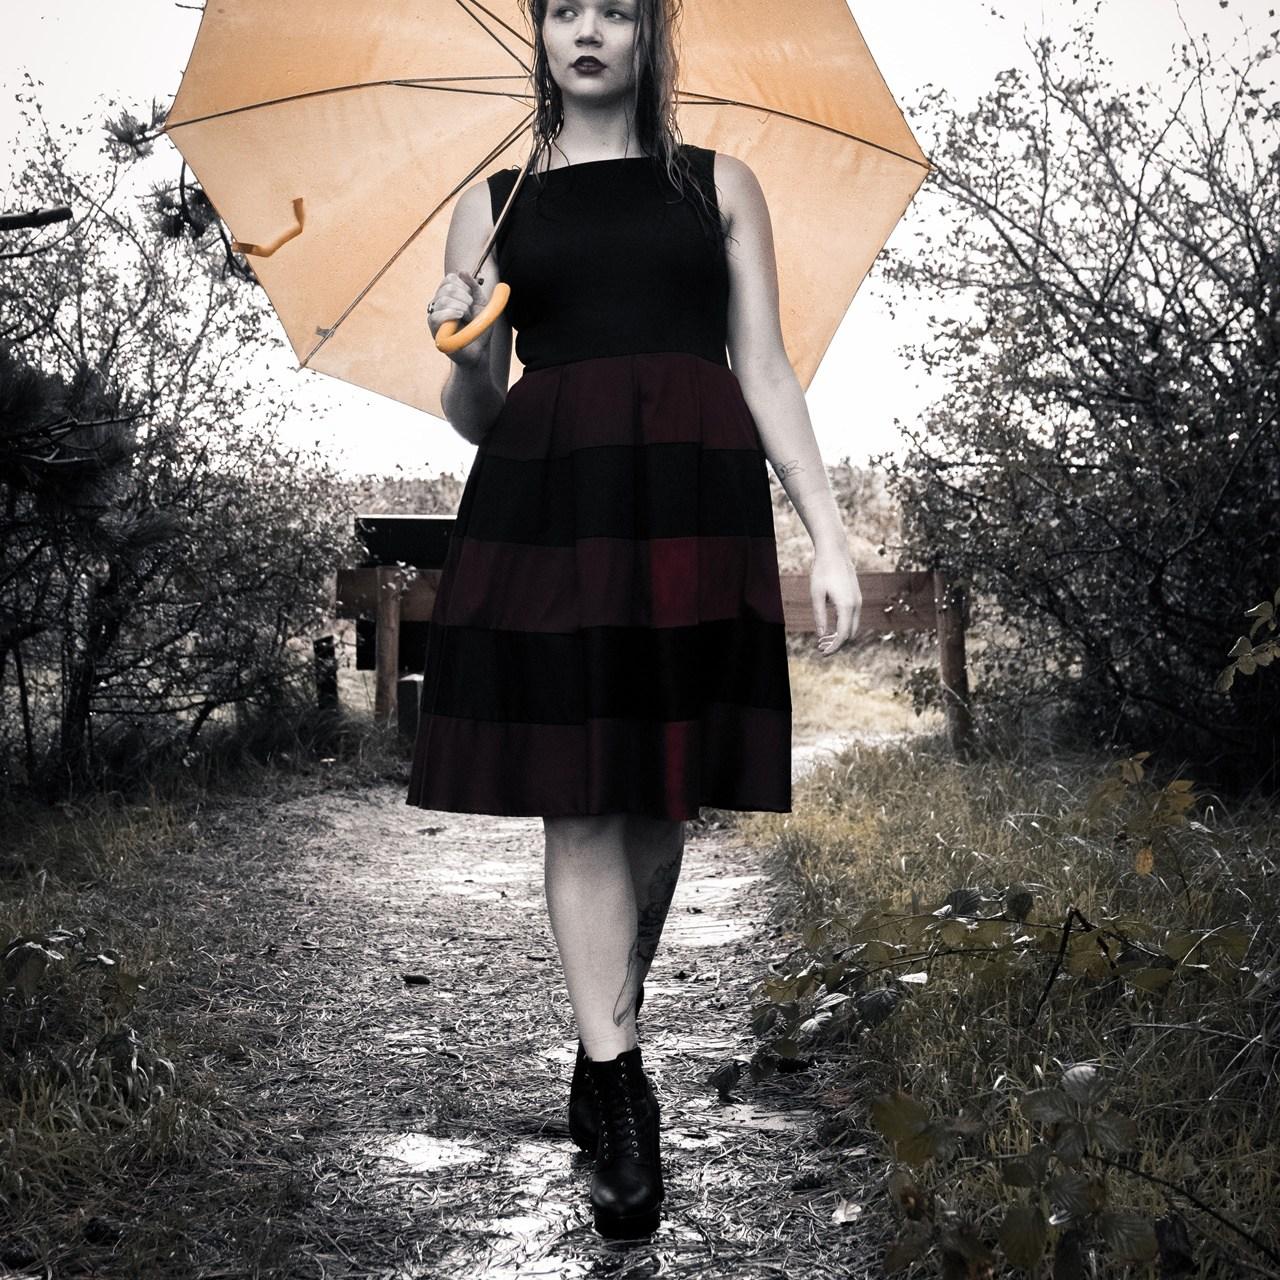 Girl Umbrella 2